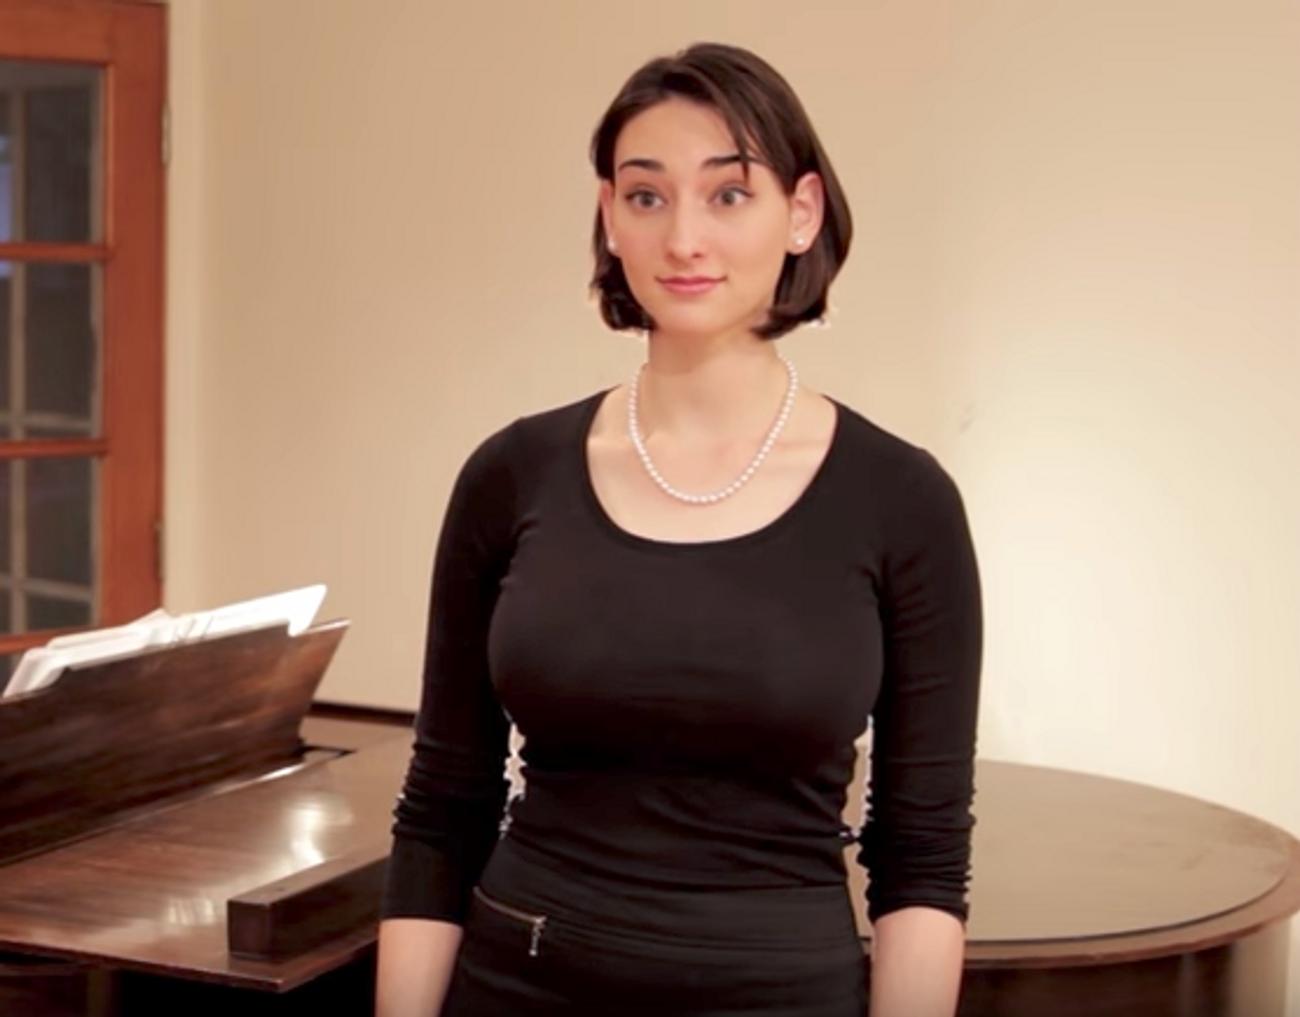 Ben Shapiro's Sister Targeted By Anti-Semitic Trolls – The Forward